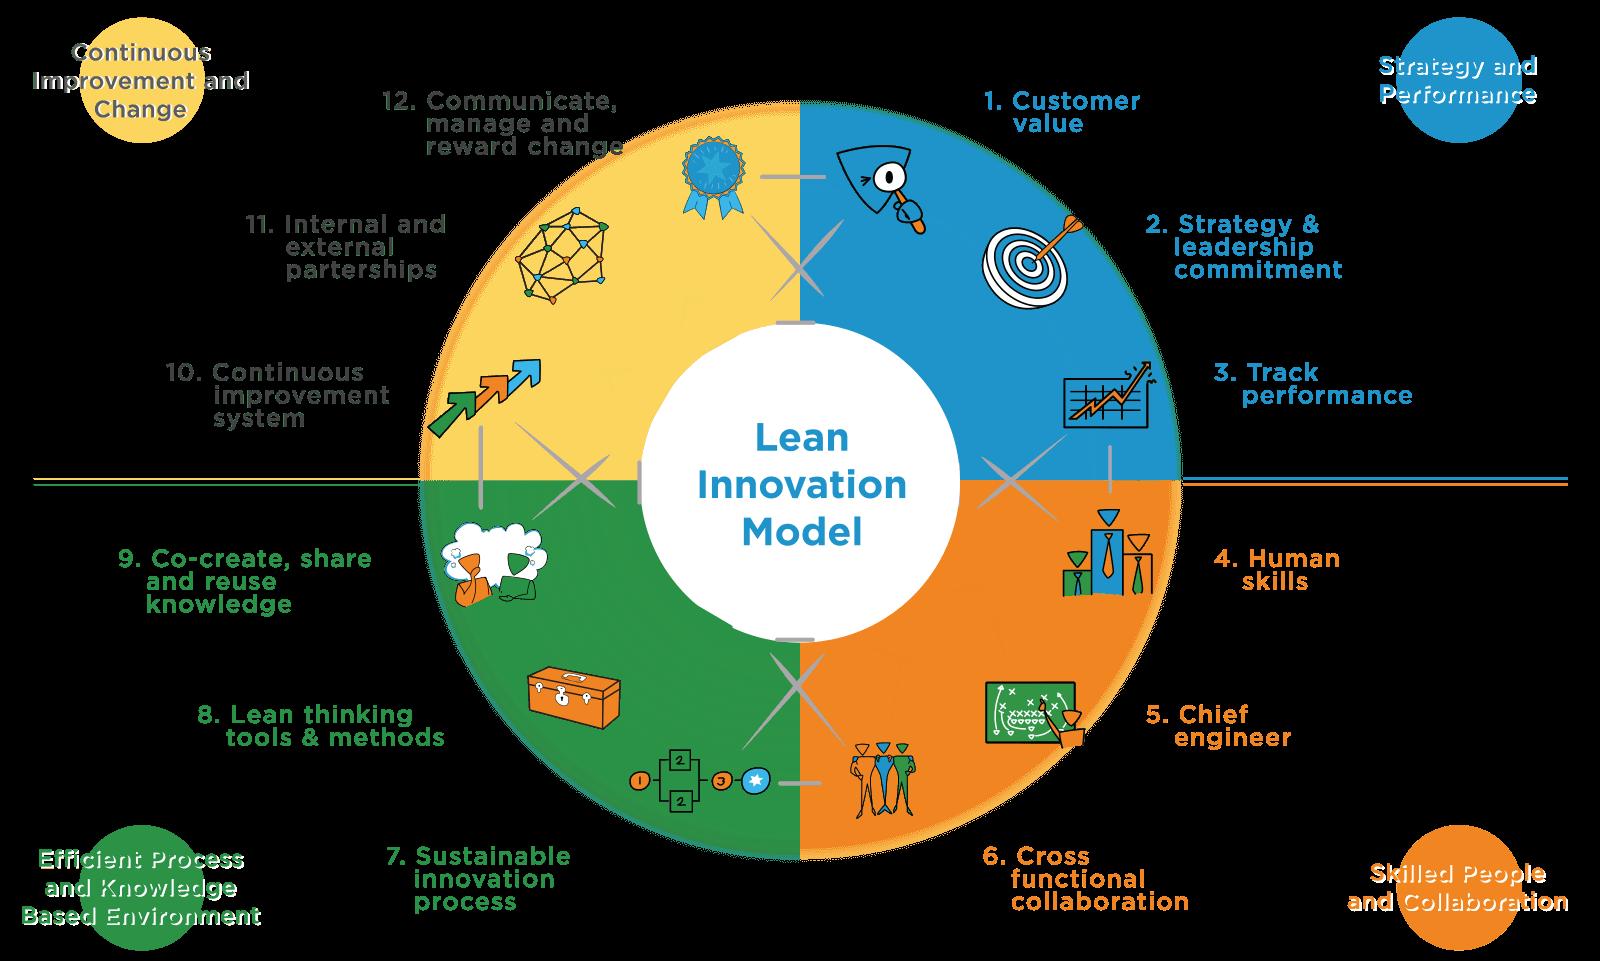 Lean thinking: Top 10 Innovation Methodologies